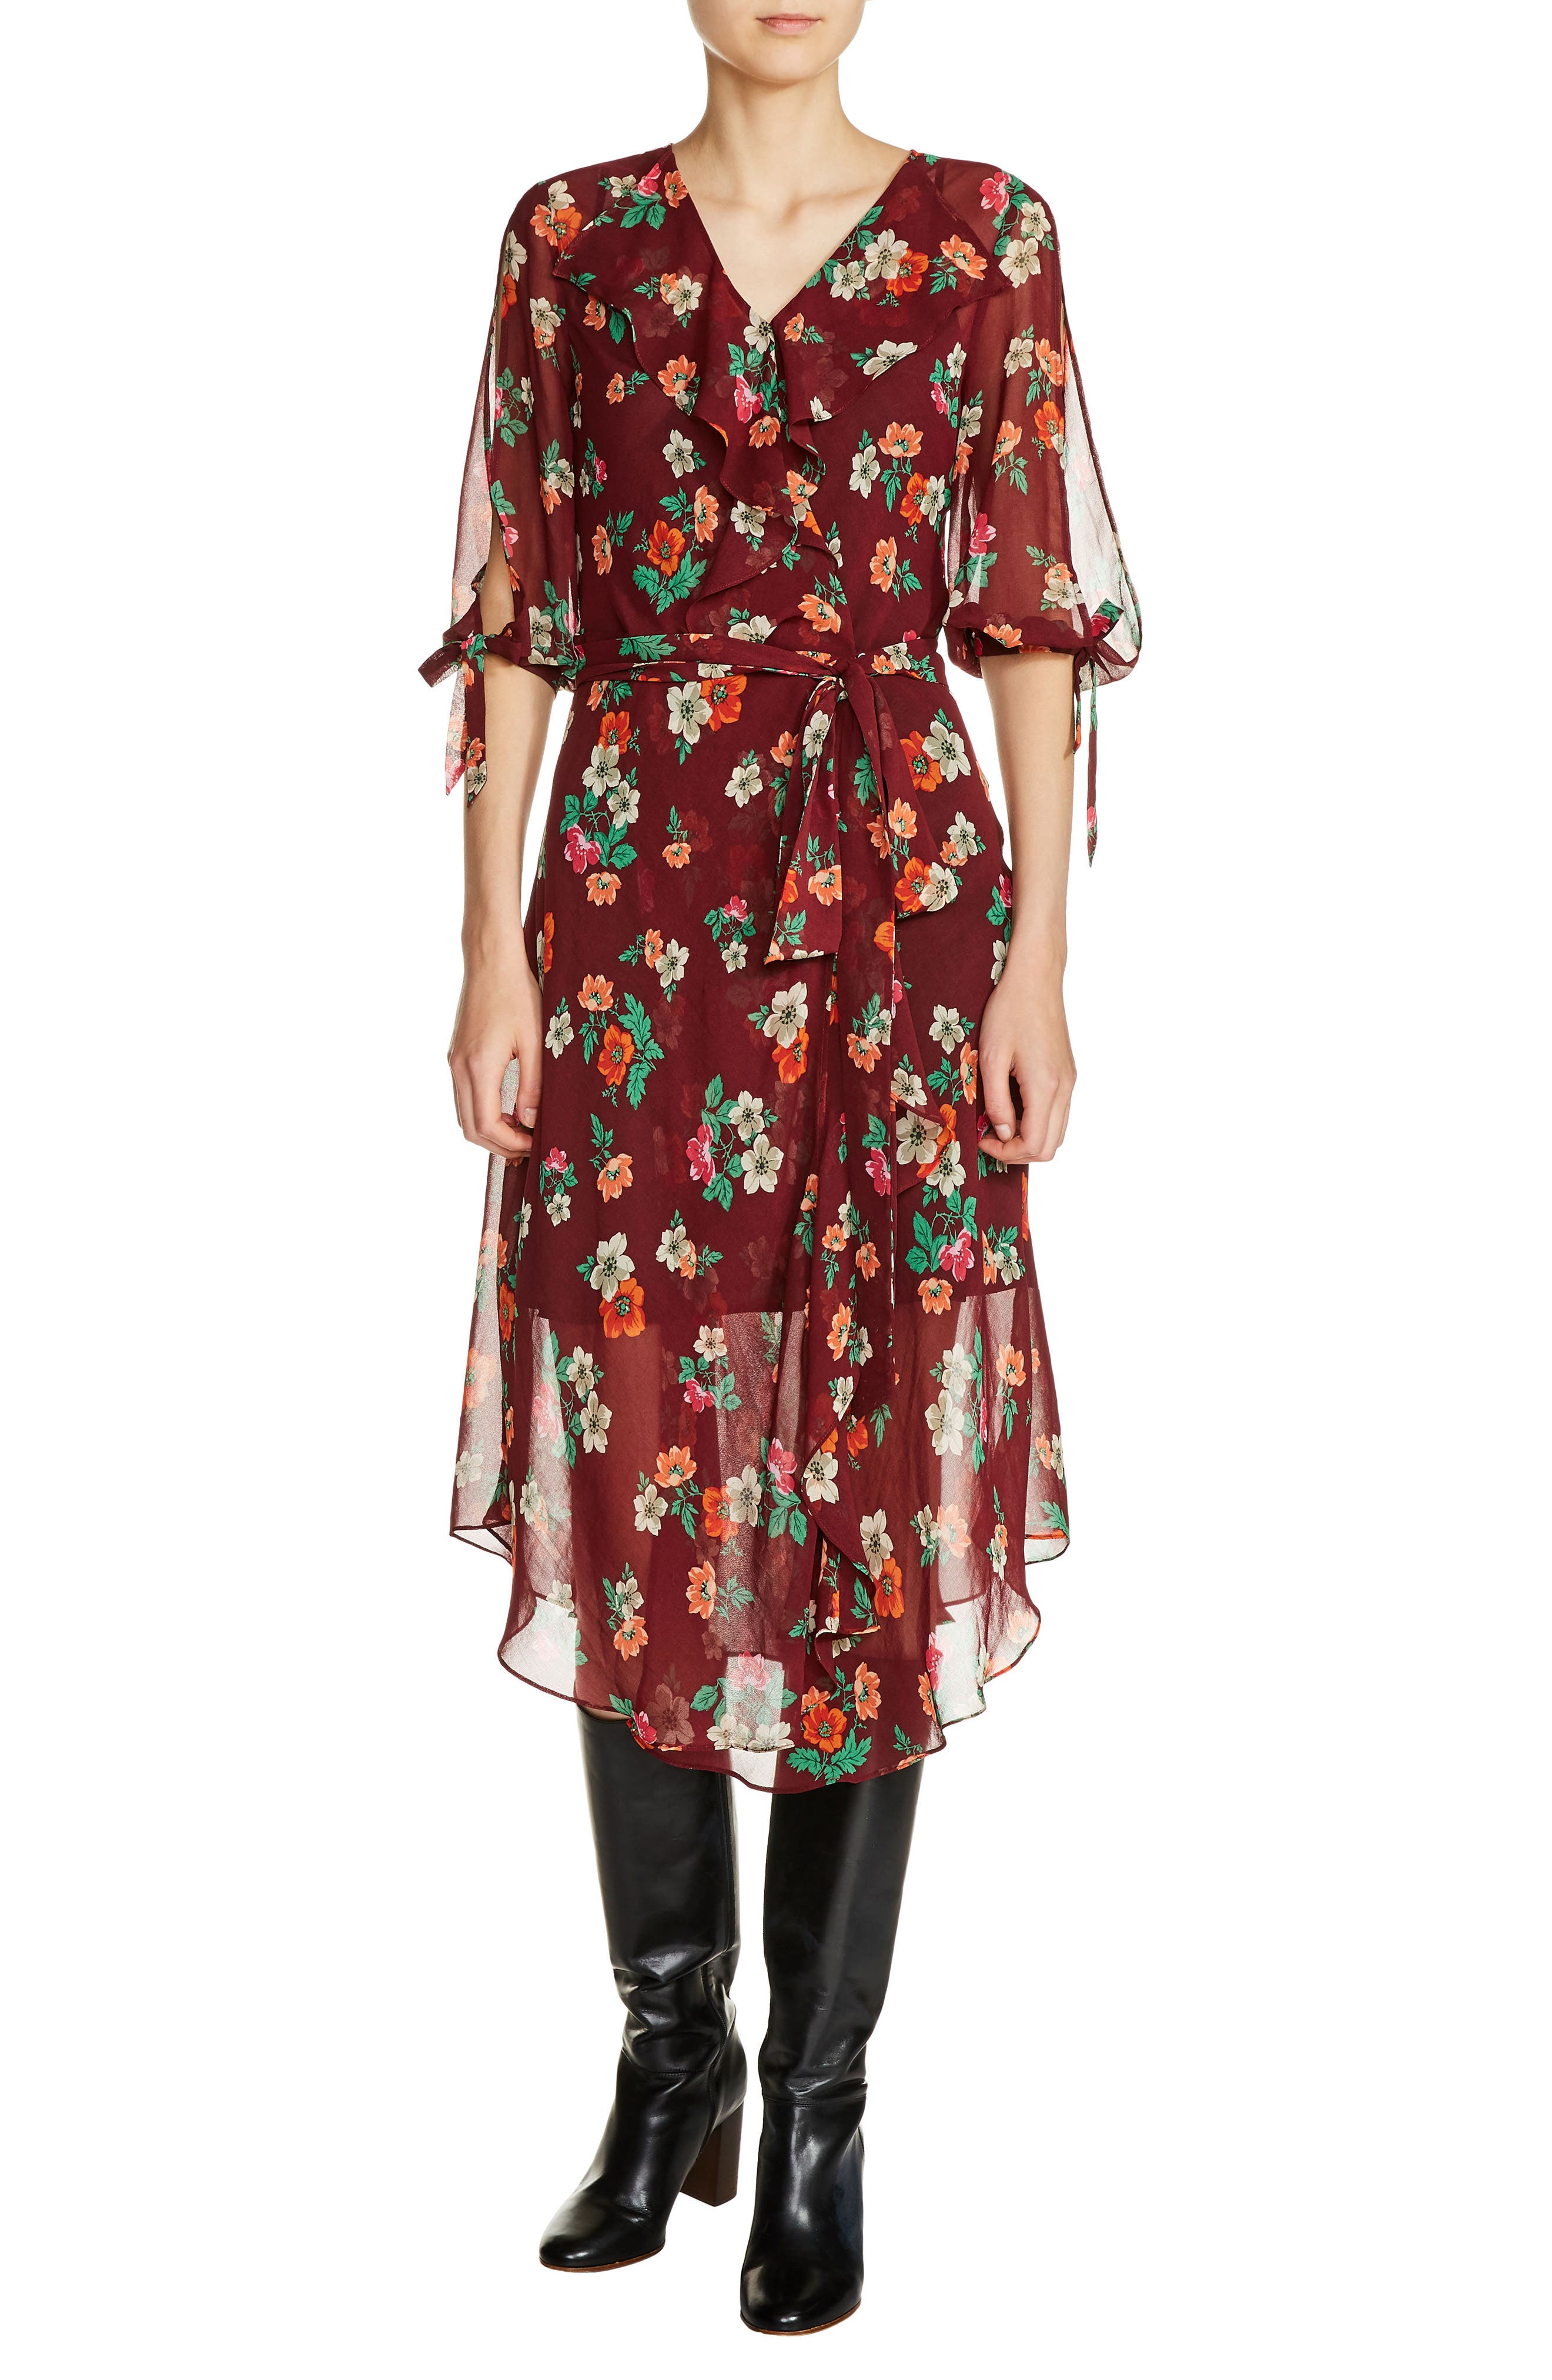 Alternate Image 1 Selected - maje Ruffle Floral Print Faux Wrap Dress